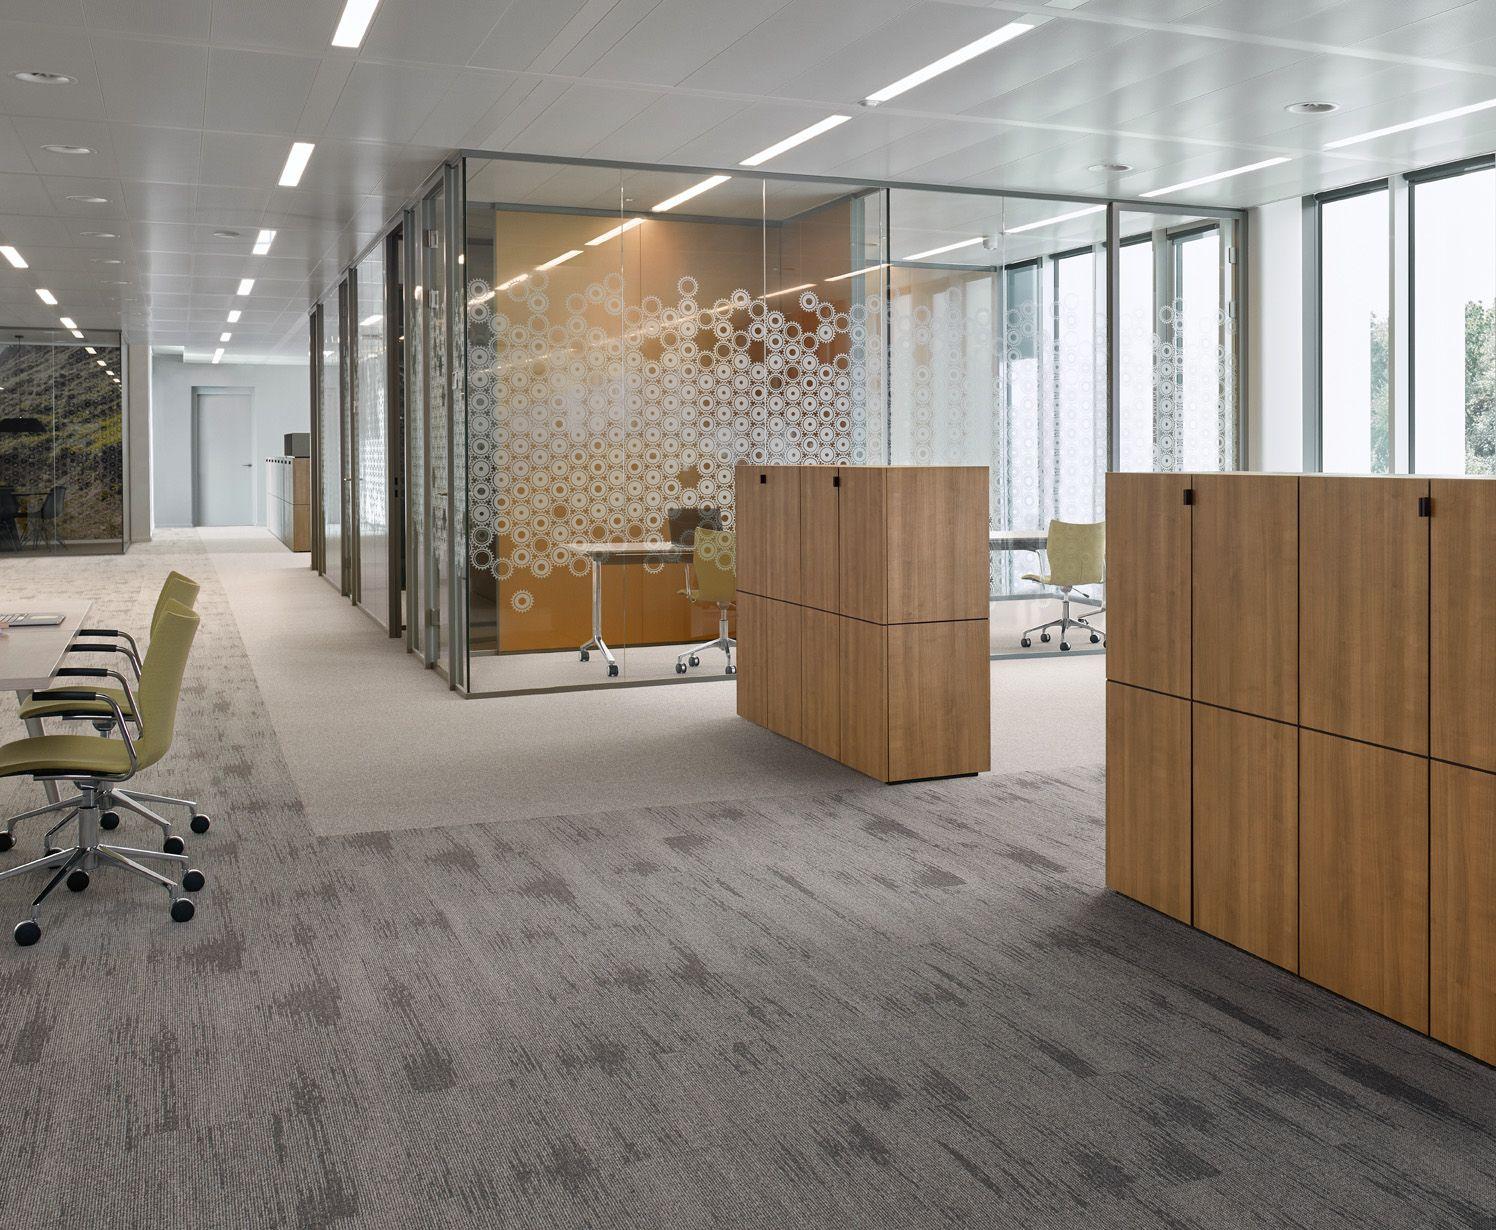 Desso Essence 2915 Desso Essence Structure 1660 Essence Collection Essence Office Floor